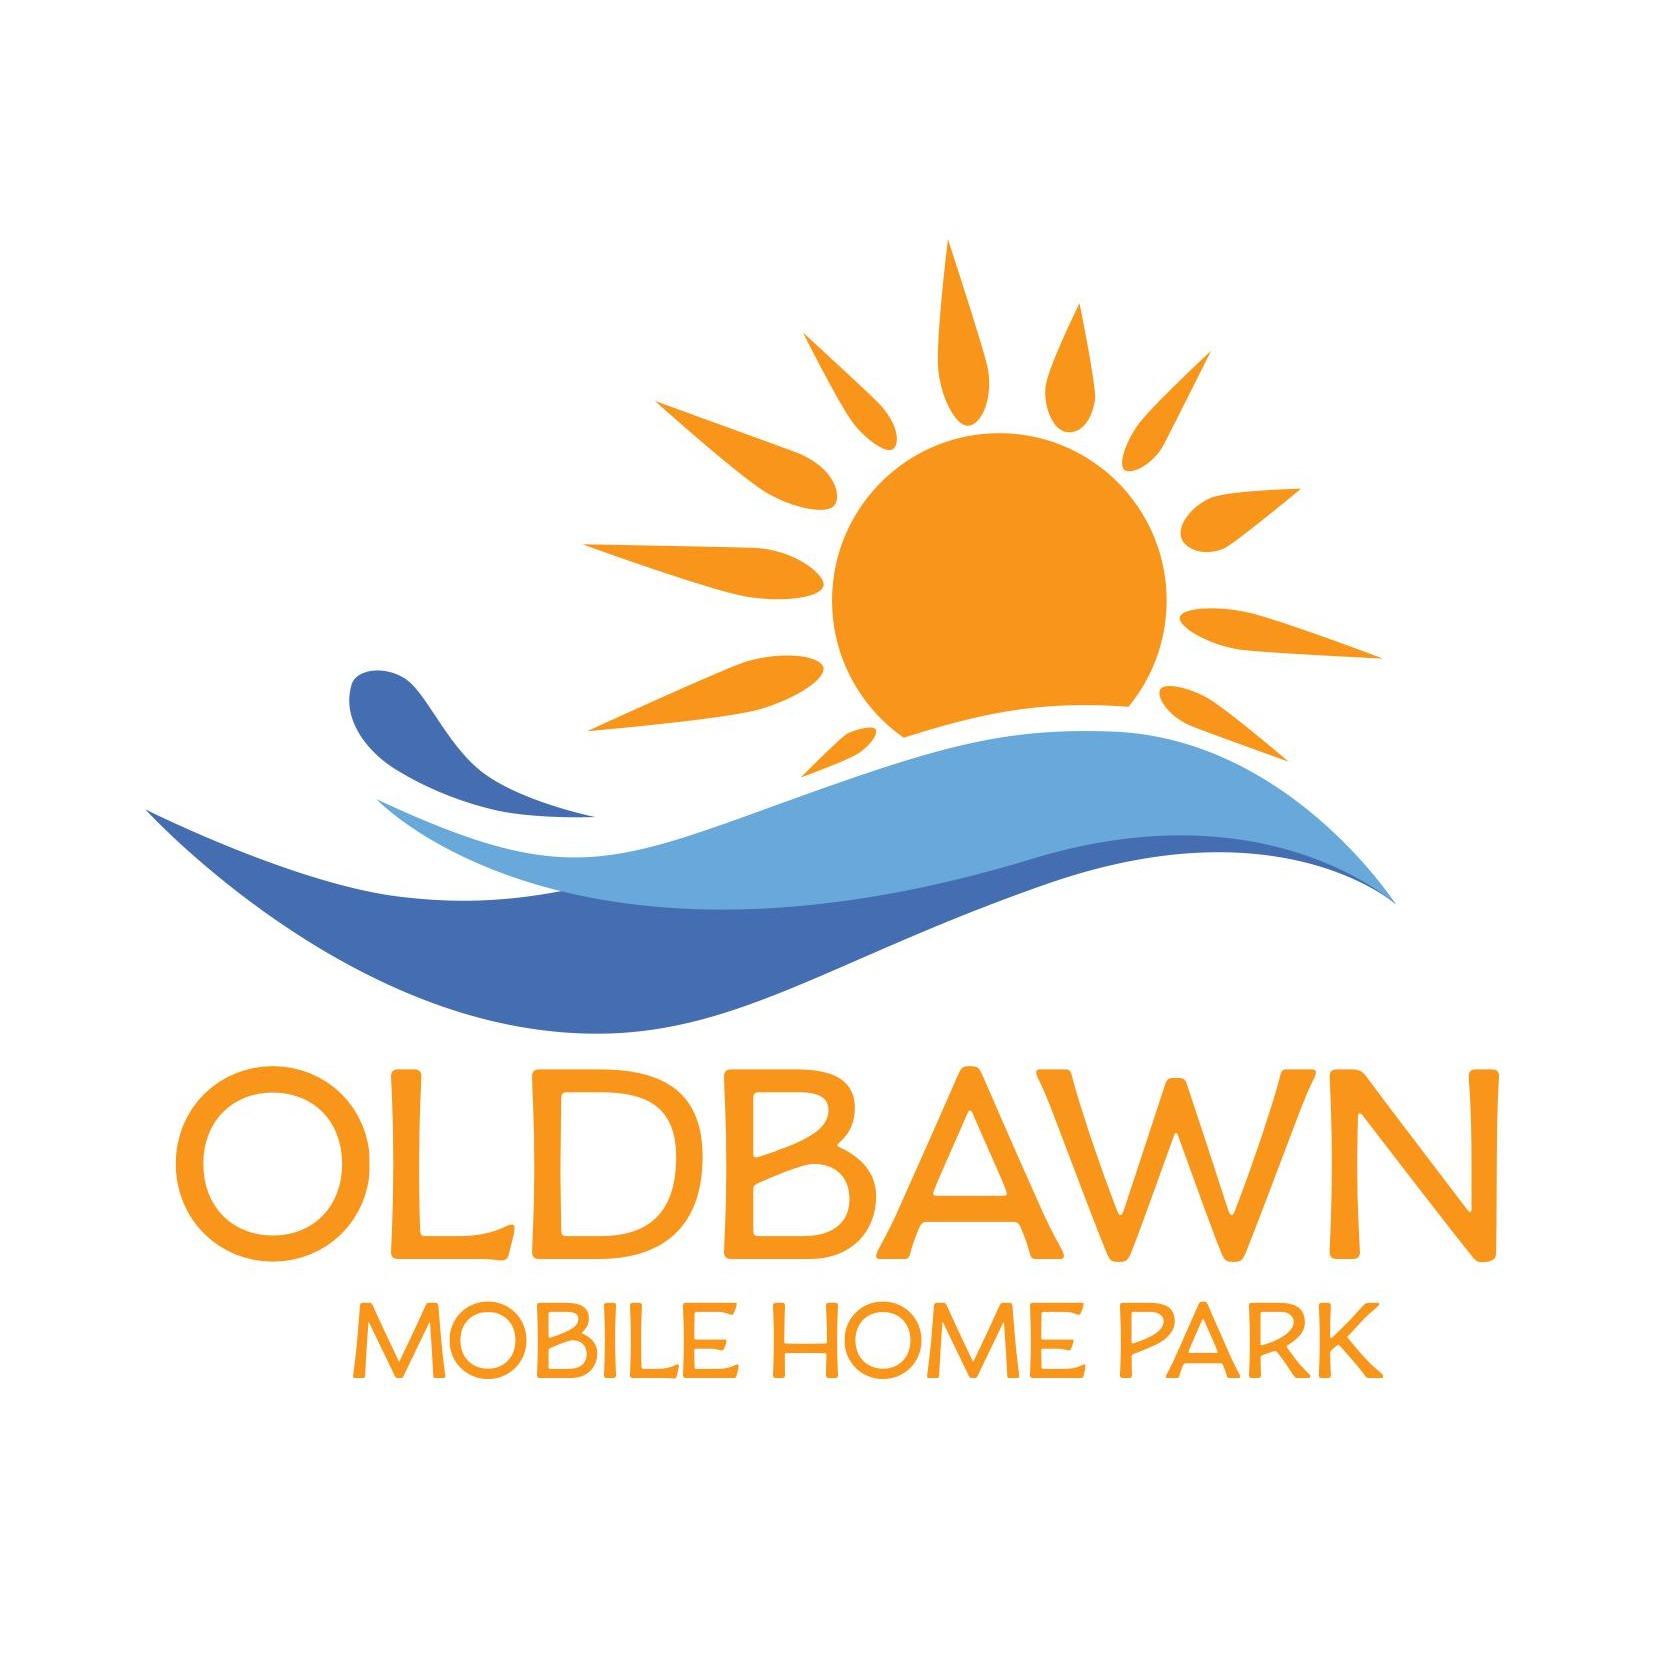 Old Bawn Caravan Park